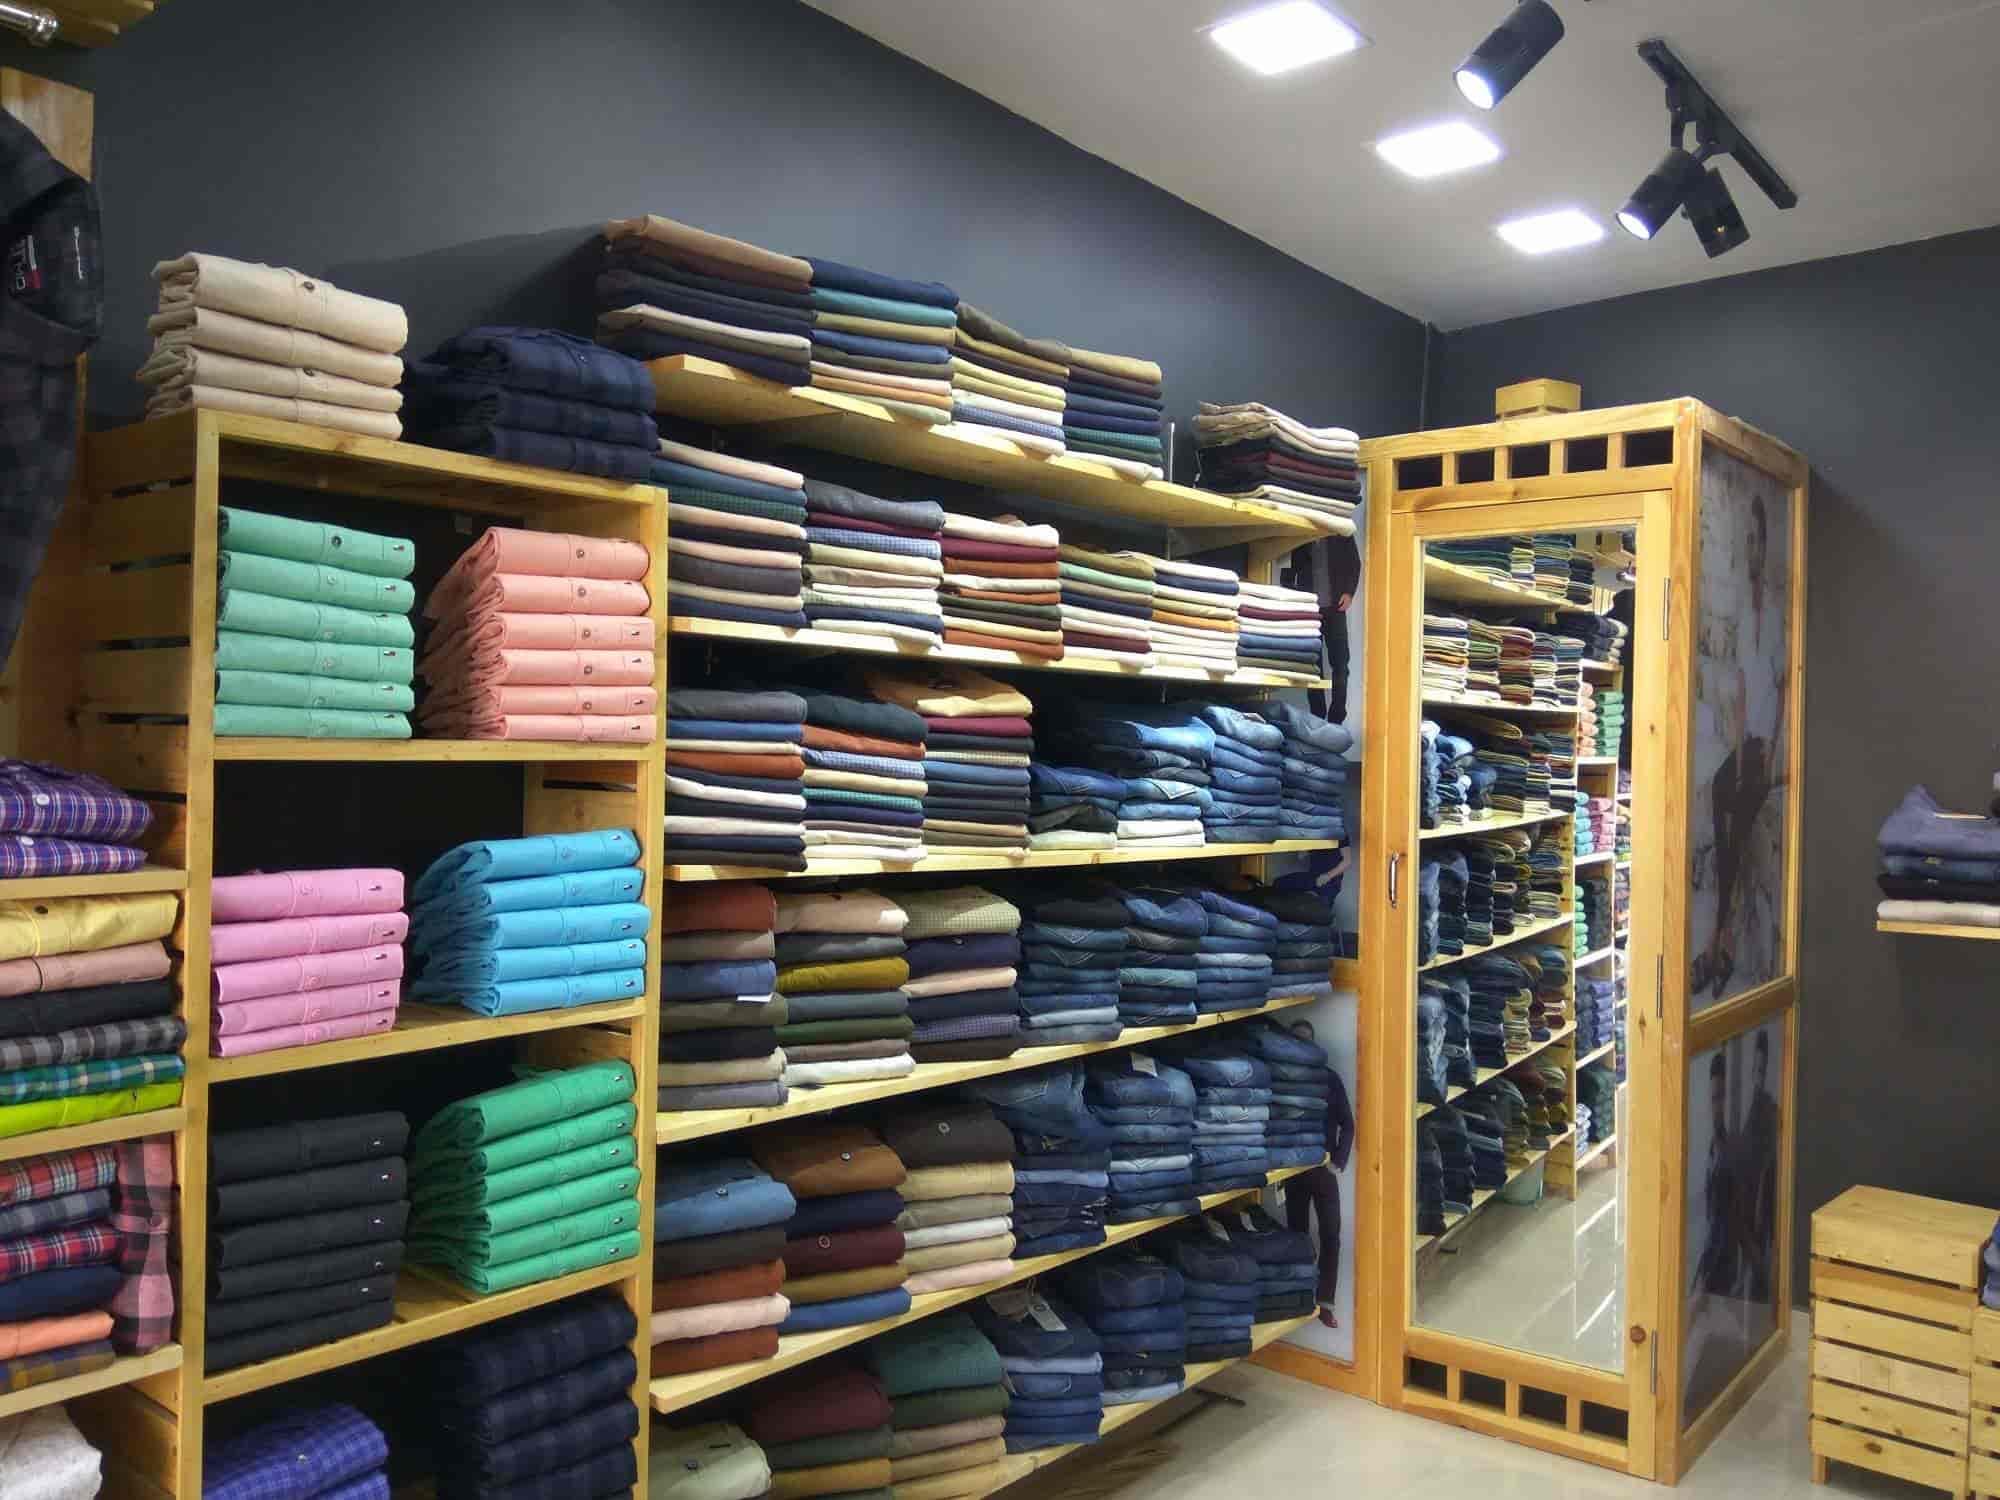 ec982d52ba8b 99 MENS Clothing, Madipakkam - Readymade Garment Retailers in Chennai -  Justdial